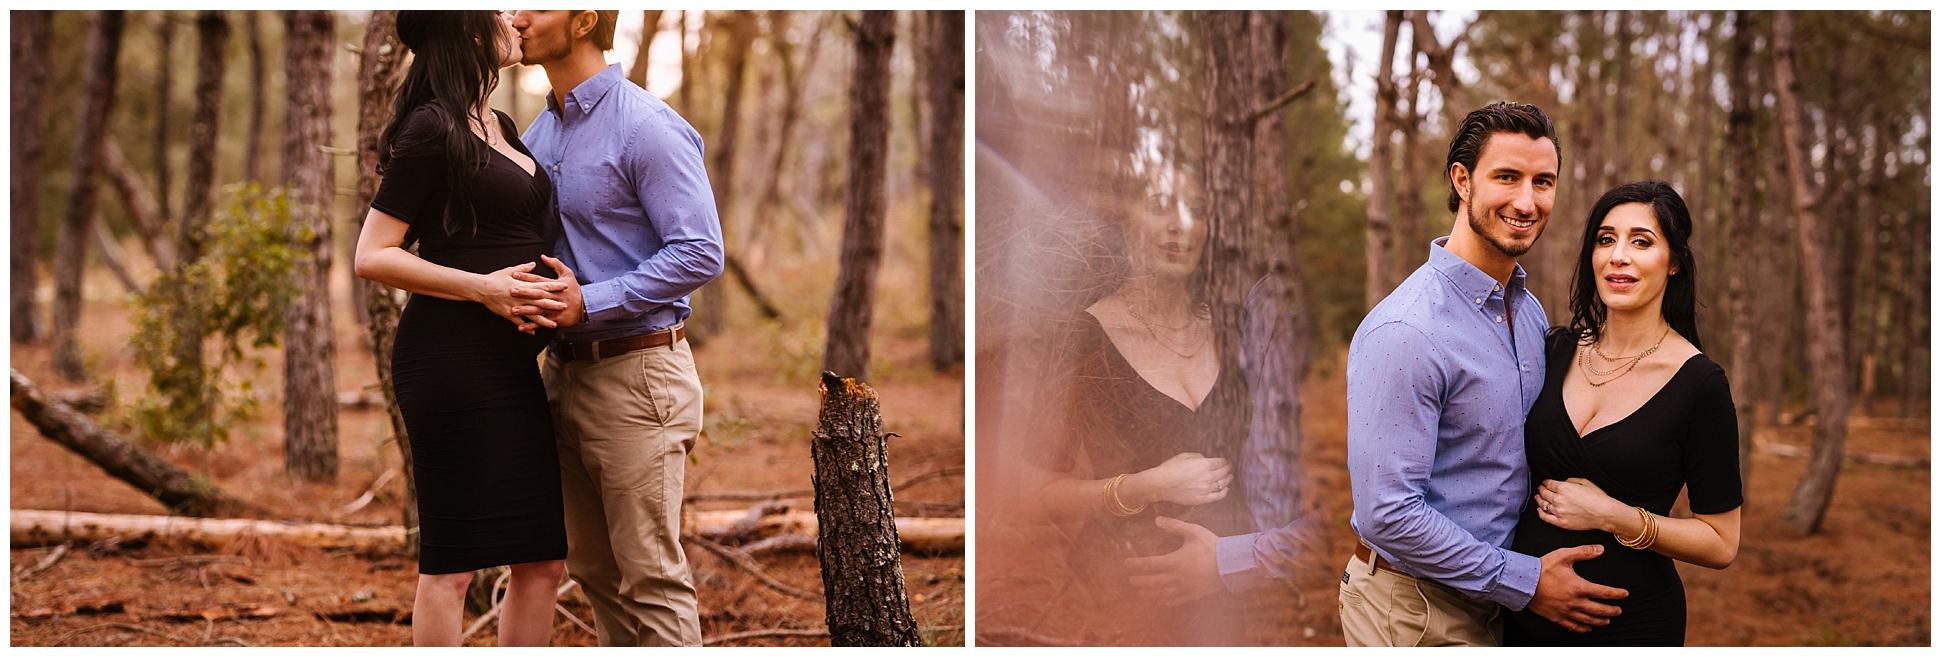 Tampa-maternity-photographer-morris-bridge-park-hip-tight-black-dress-woods_0014.jpg